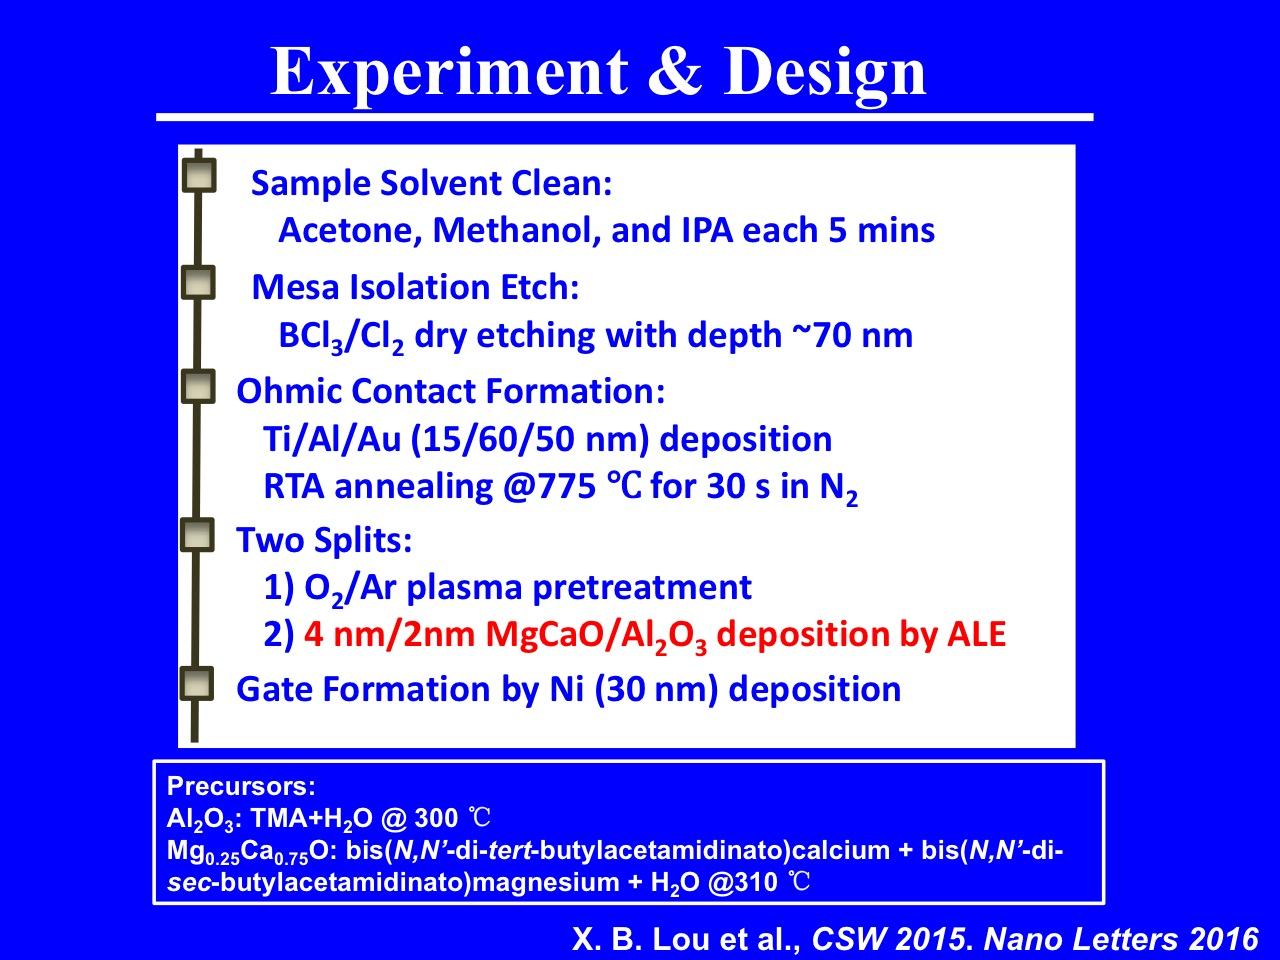 nanoHUB org - Resources: Atomic Layer Epitaxy Dielectrics